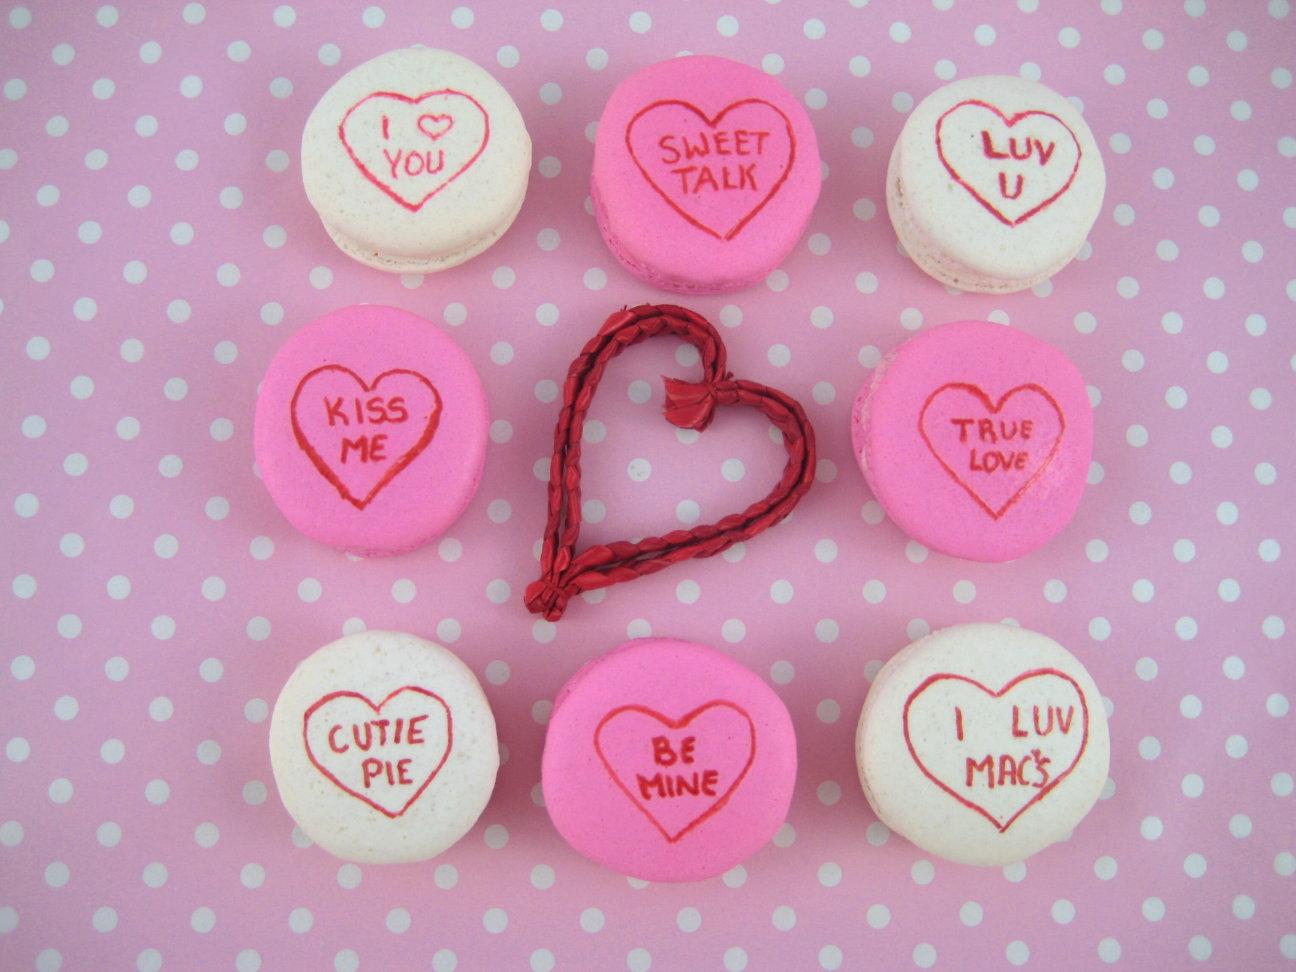 http://1.bp.blogspot.com/_DapjjltUZPo/TVJq7uU3X0I/AAAAAAAABqg/RtM6aiW3wM0/s1600/valentine%2Bmacarons%2Bconversation%2Bhearts%2Bbubble%2Band%2Bsweet.jpg